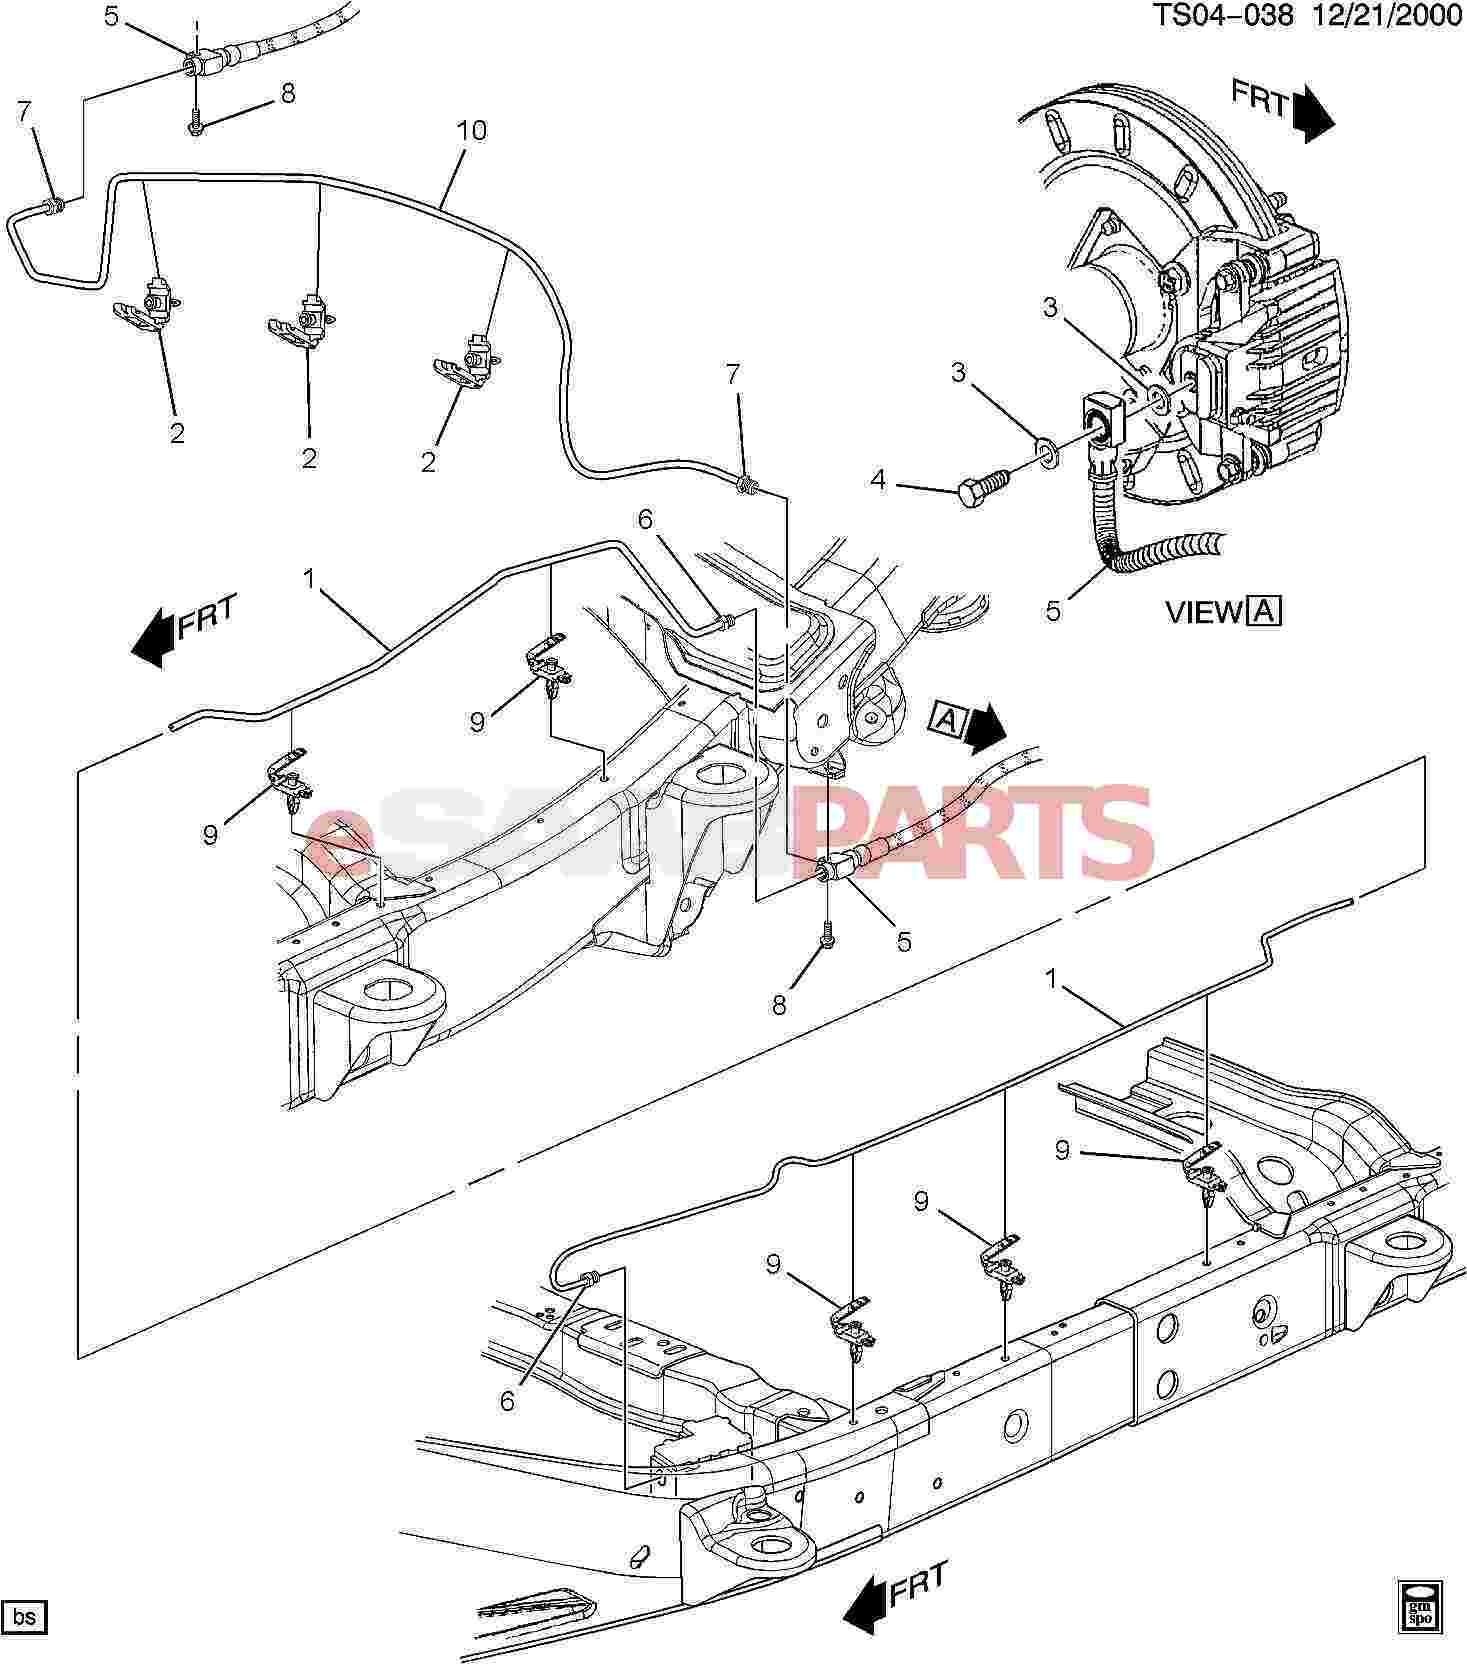 drum brake assembly diagram bunton bobcat ryan xm3611 all